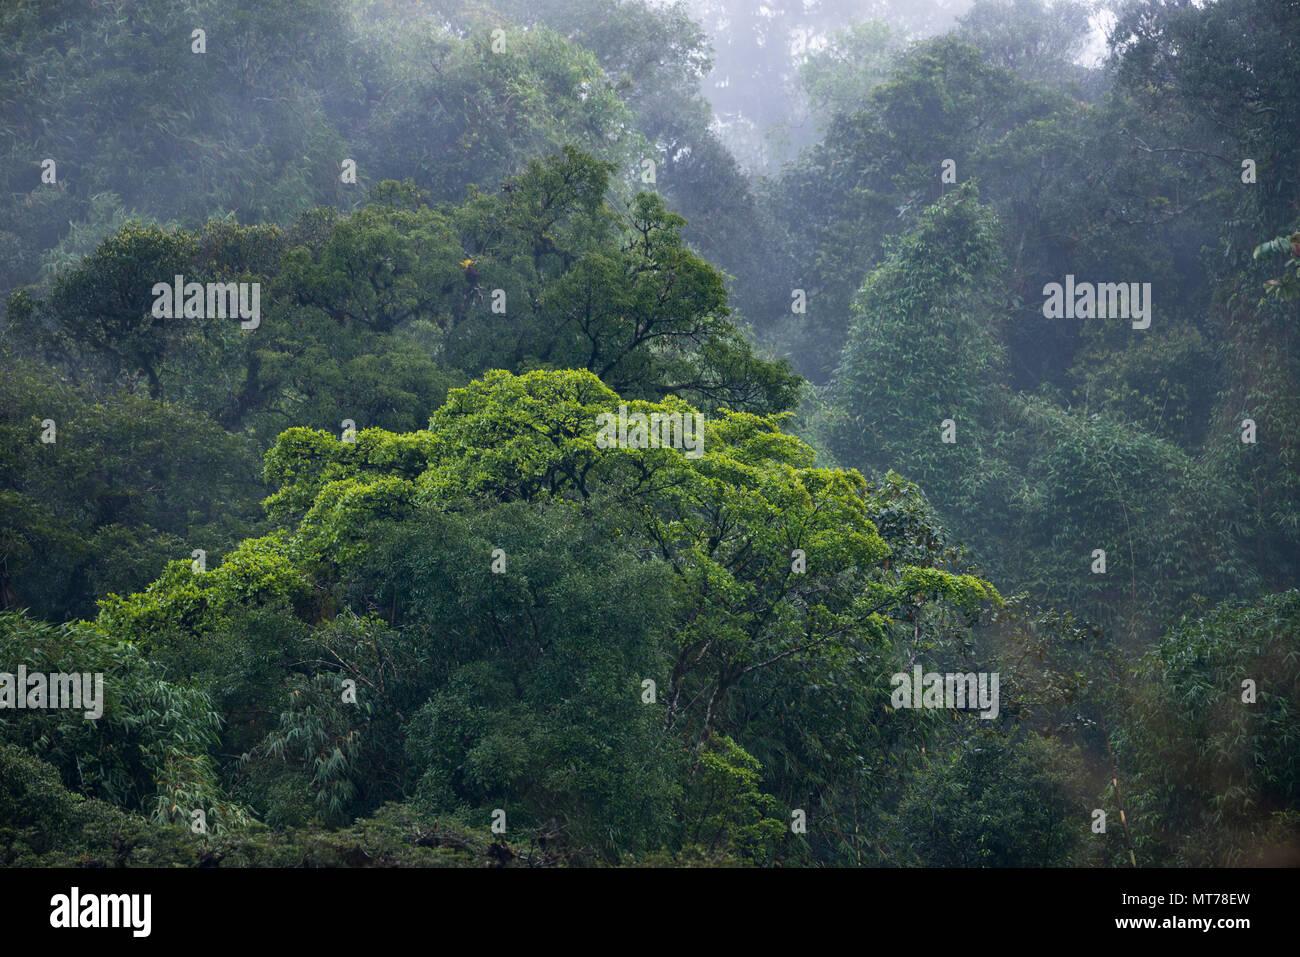 Primary Atlantic Rainforest from São Paulo State, SE Brazil - Stock Image